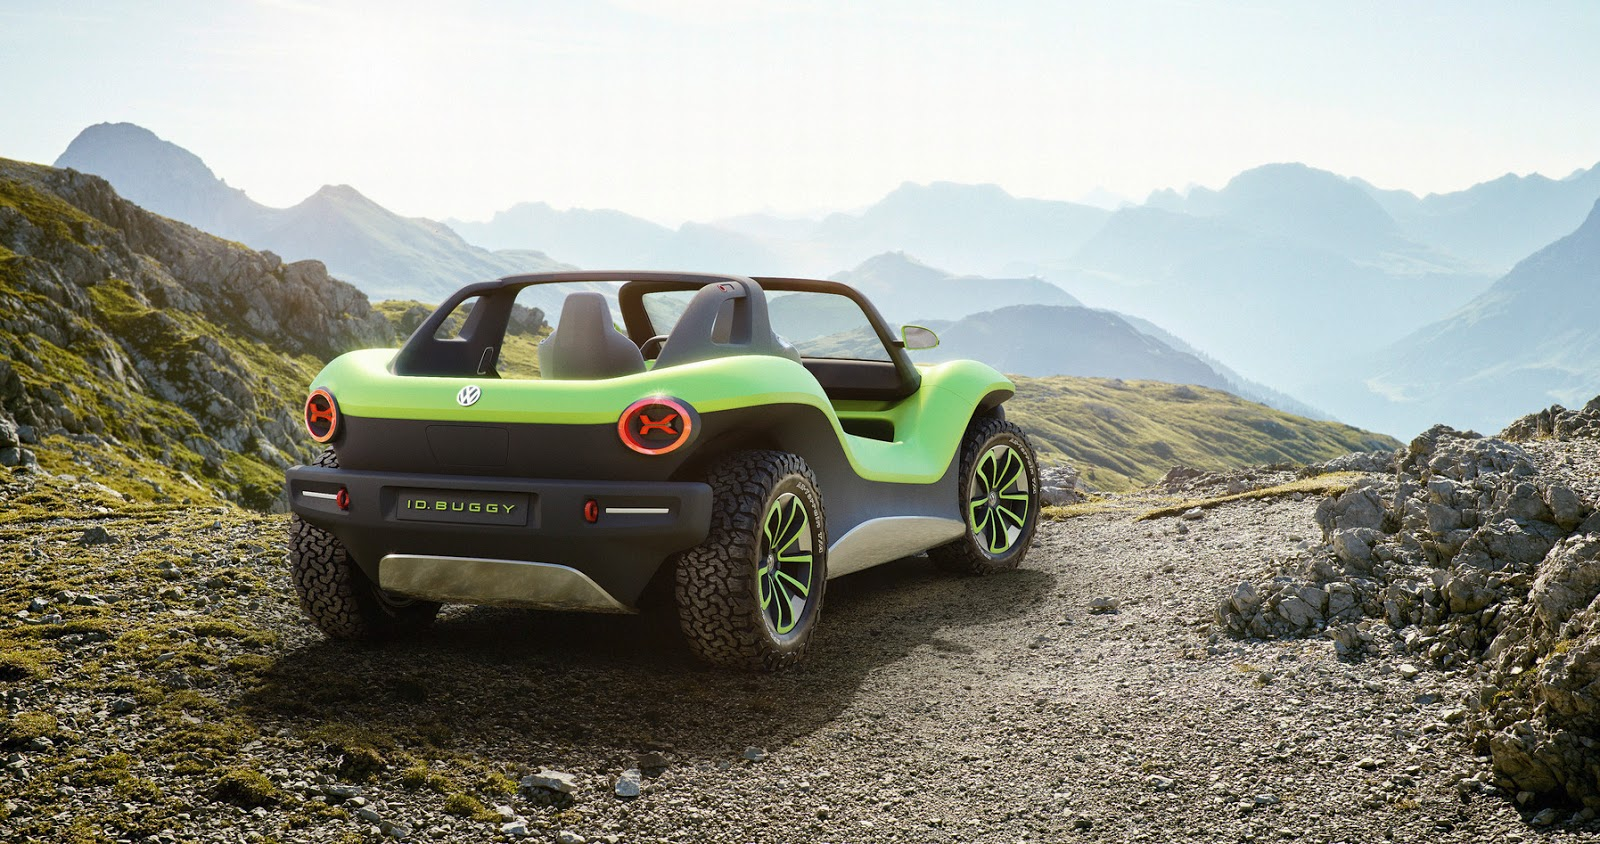 ID.Buggy2B252812529 Με 4 πρεμιέρες στη Γενεύη η Volkswagen Volkswagen, VW, Έκθεση Γενεύης, Σαλόνι Αυτοκινήτου της Γενεύης